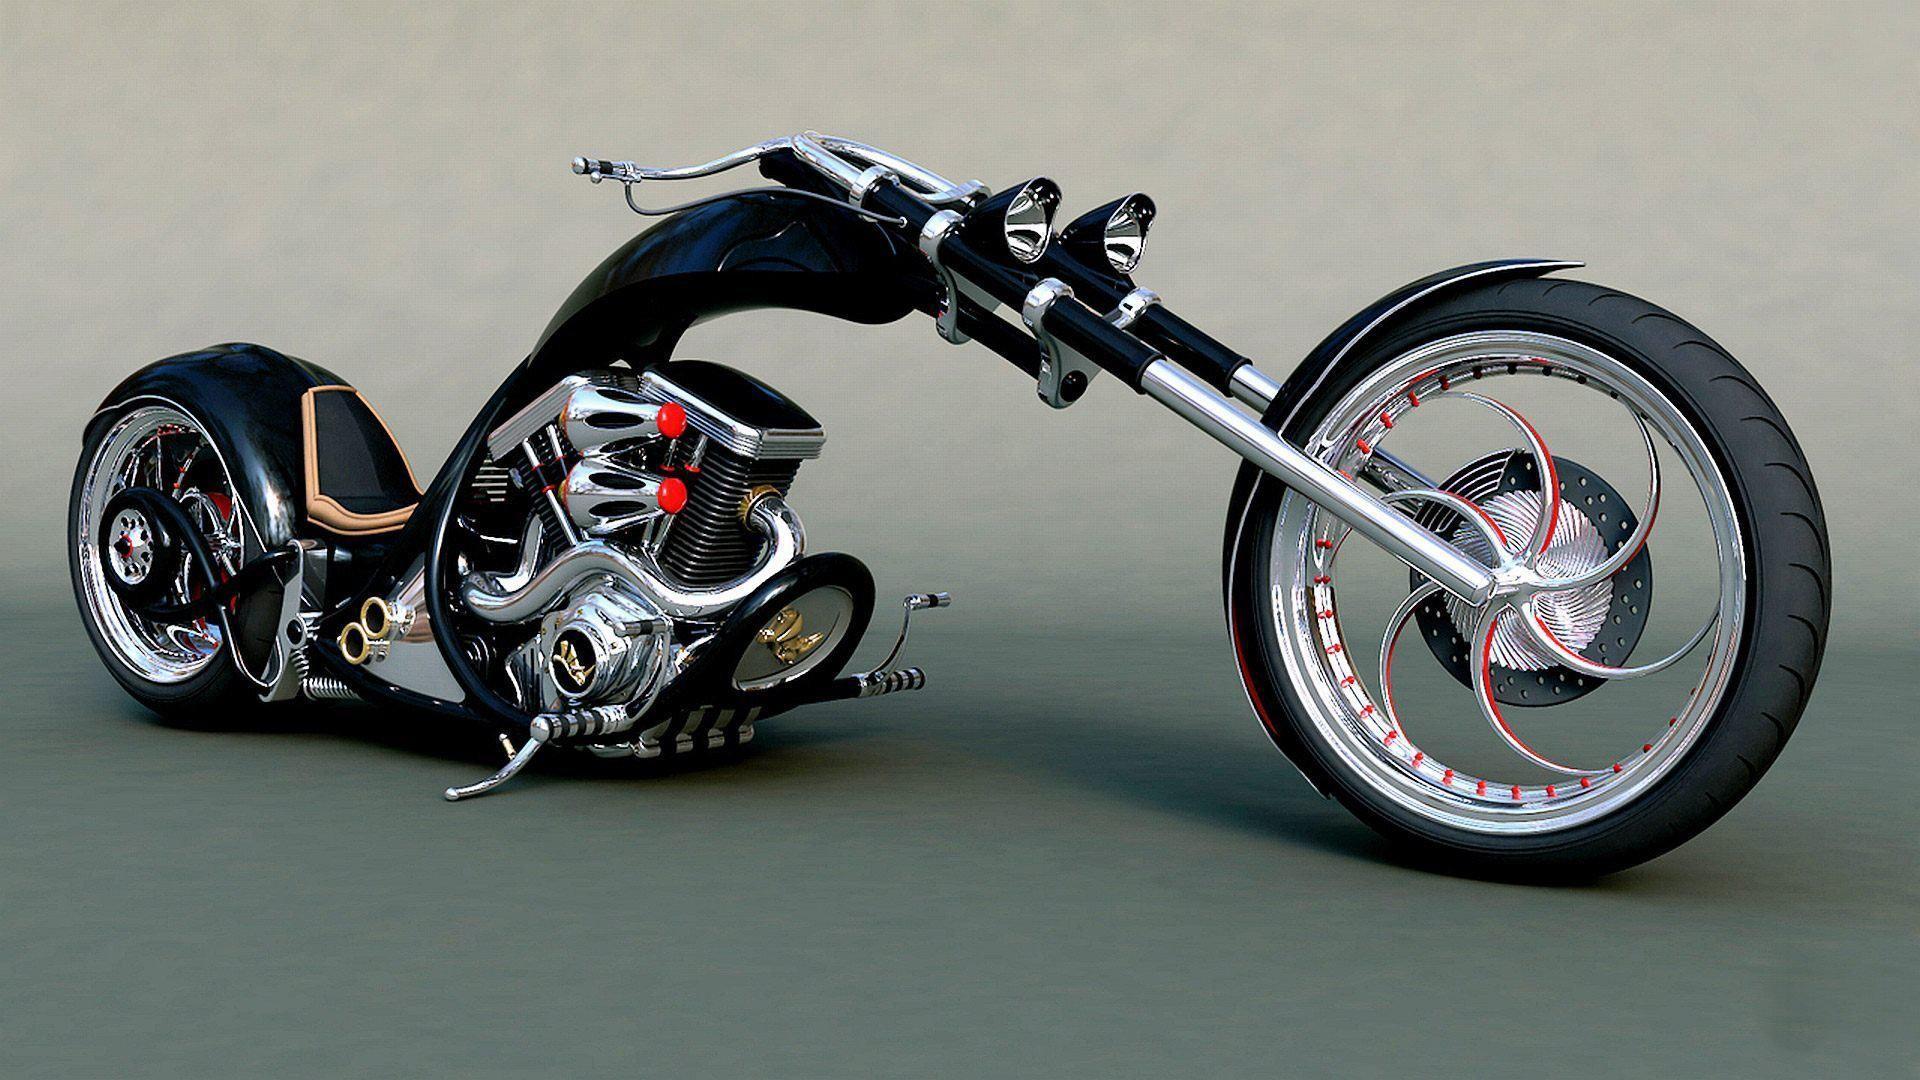 Chopper Bike Tuning Motorbike Motorcycle Hot Rod Rods Custom Desktop  Background Images